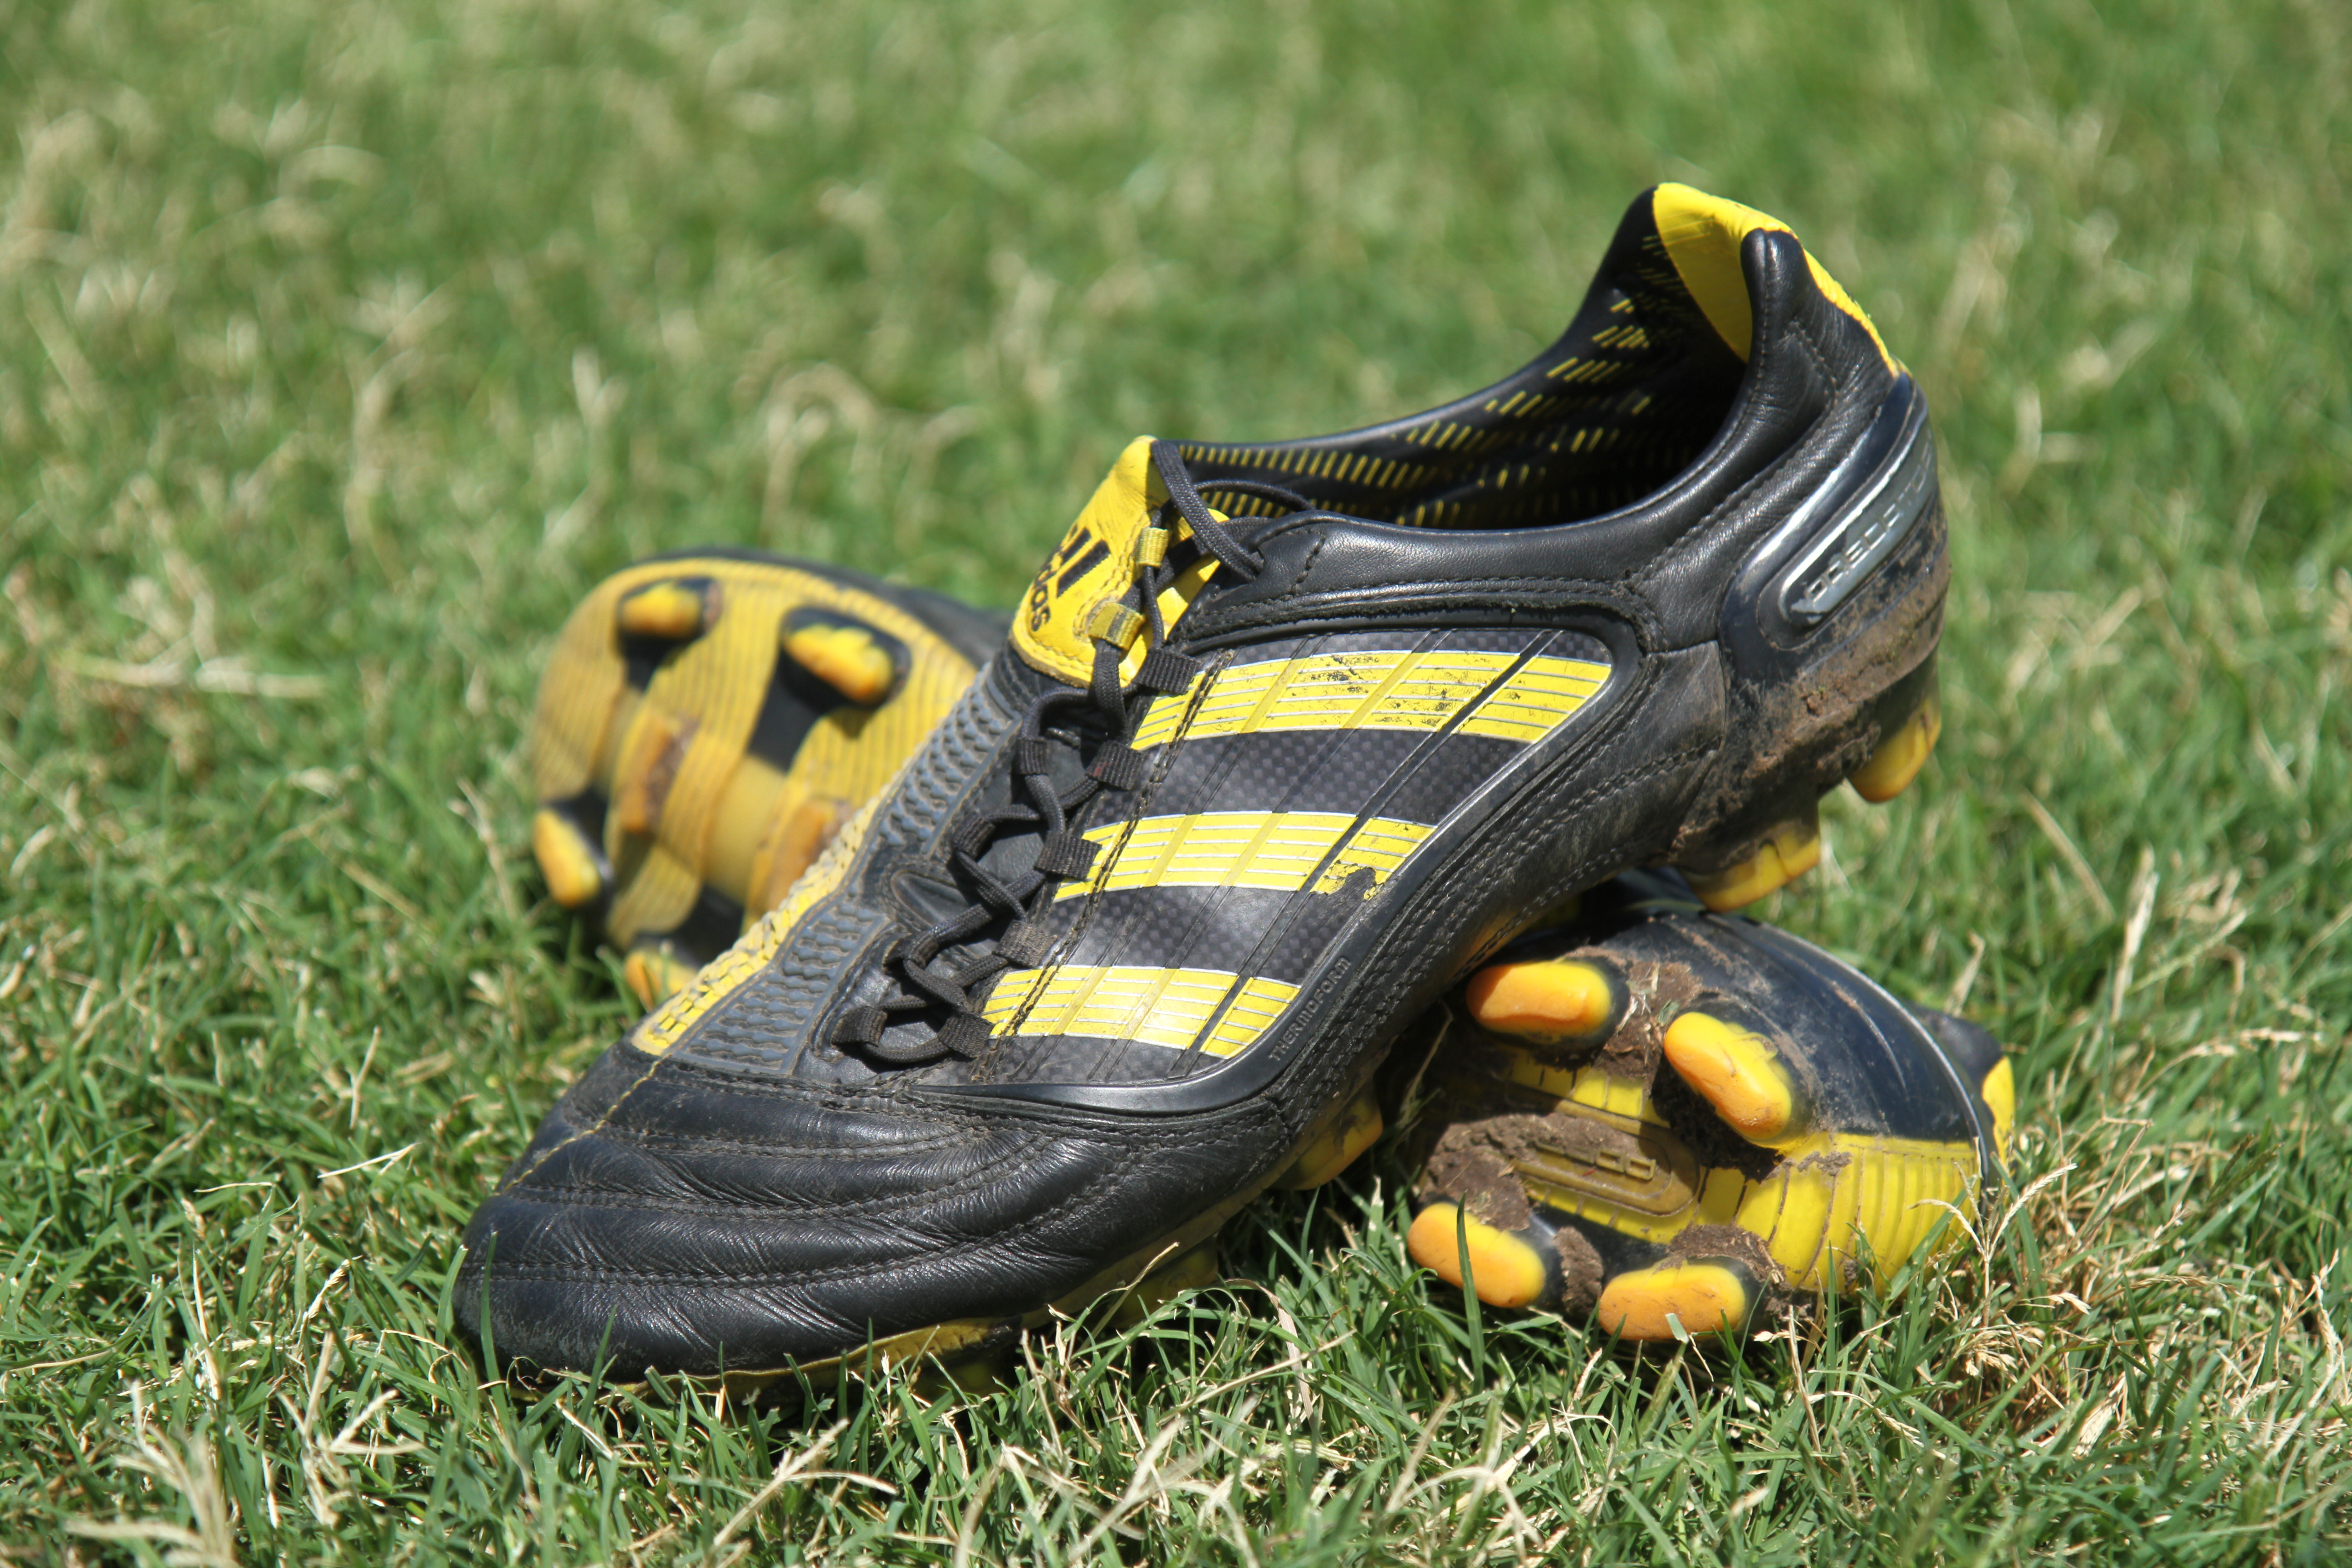 ac49c66d7 Adidas Predator X Football Boot Test & Review | www.footballboots.co.uk